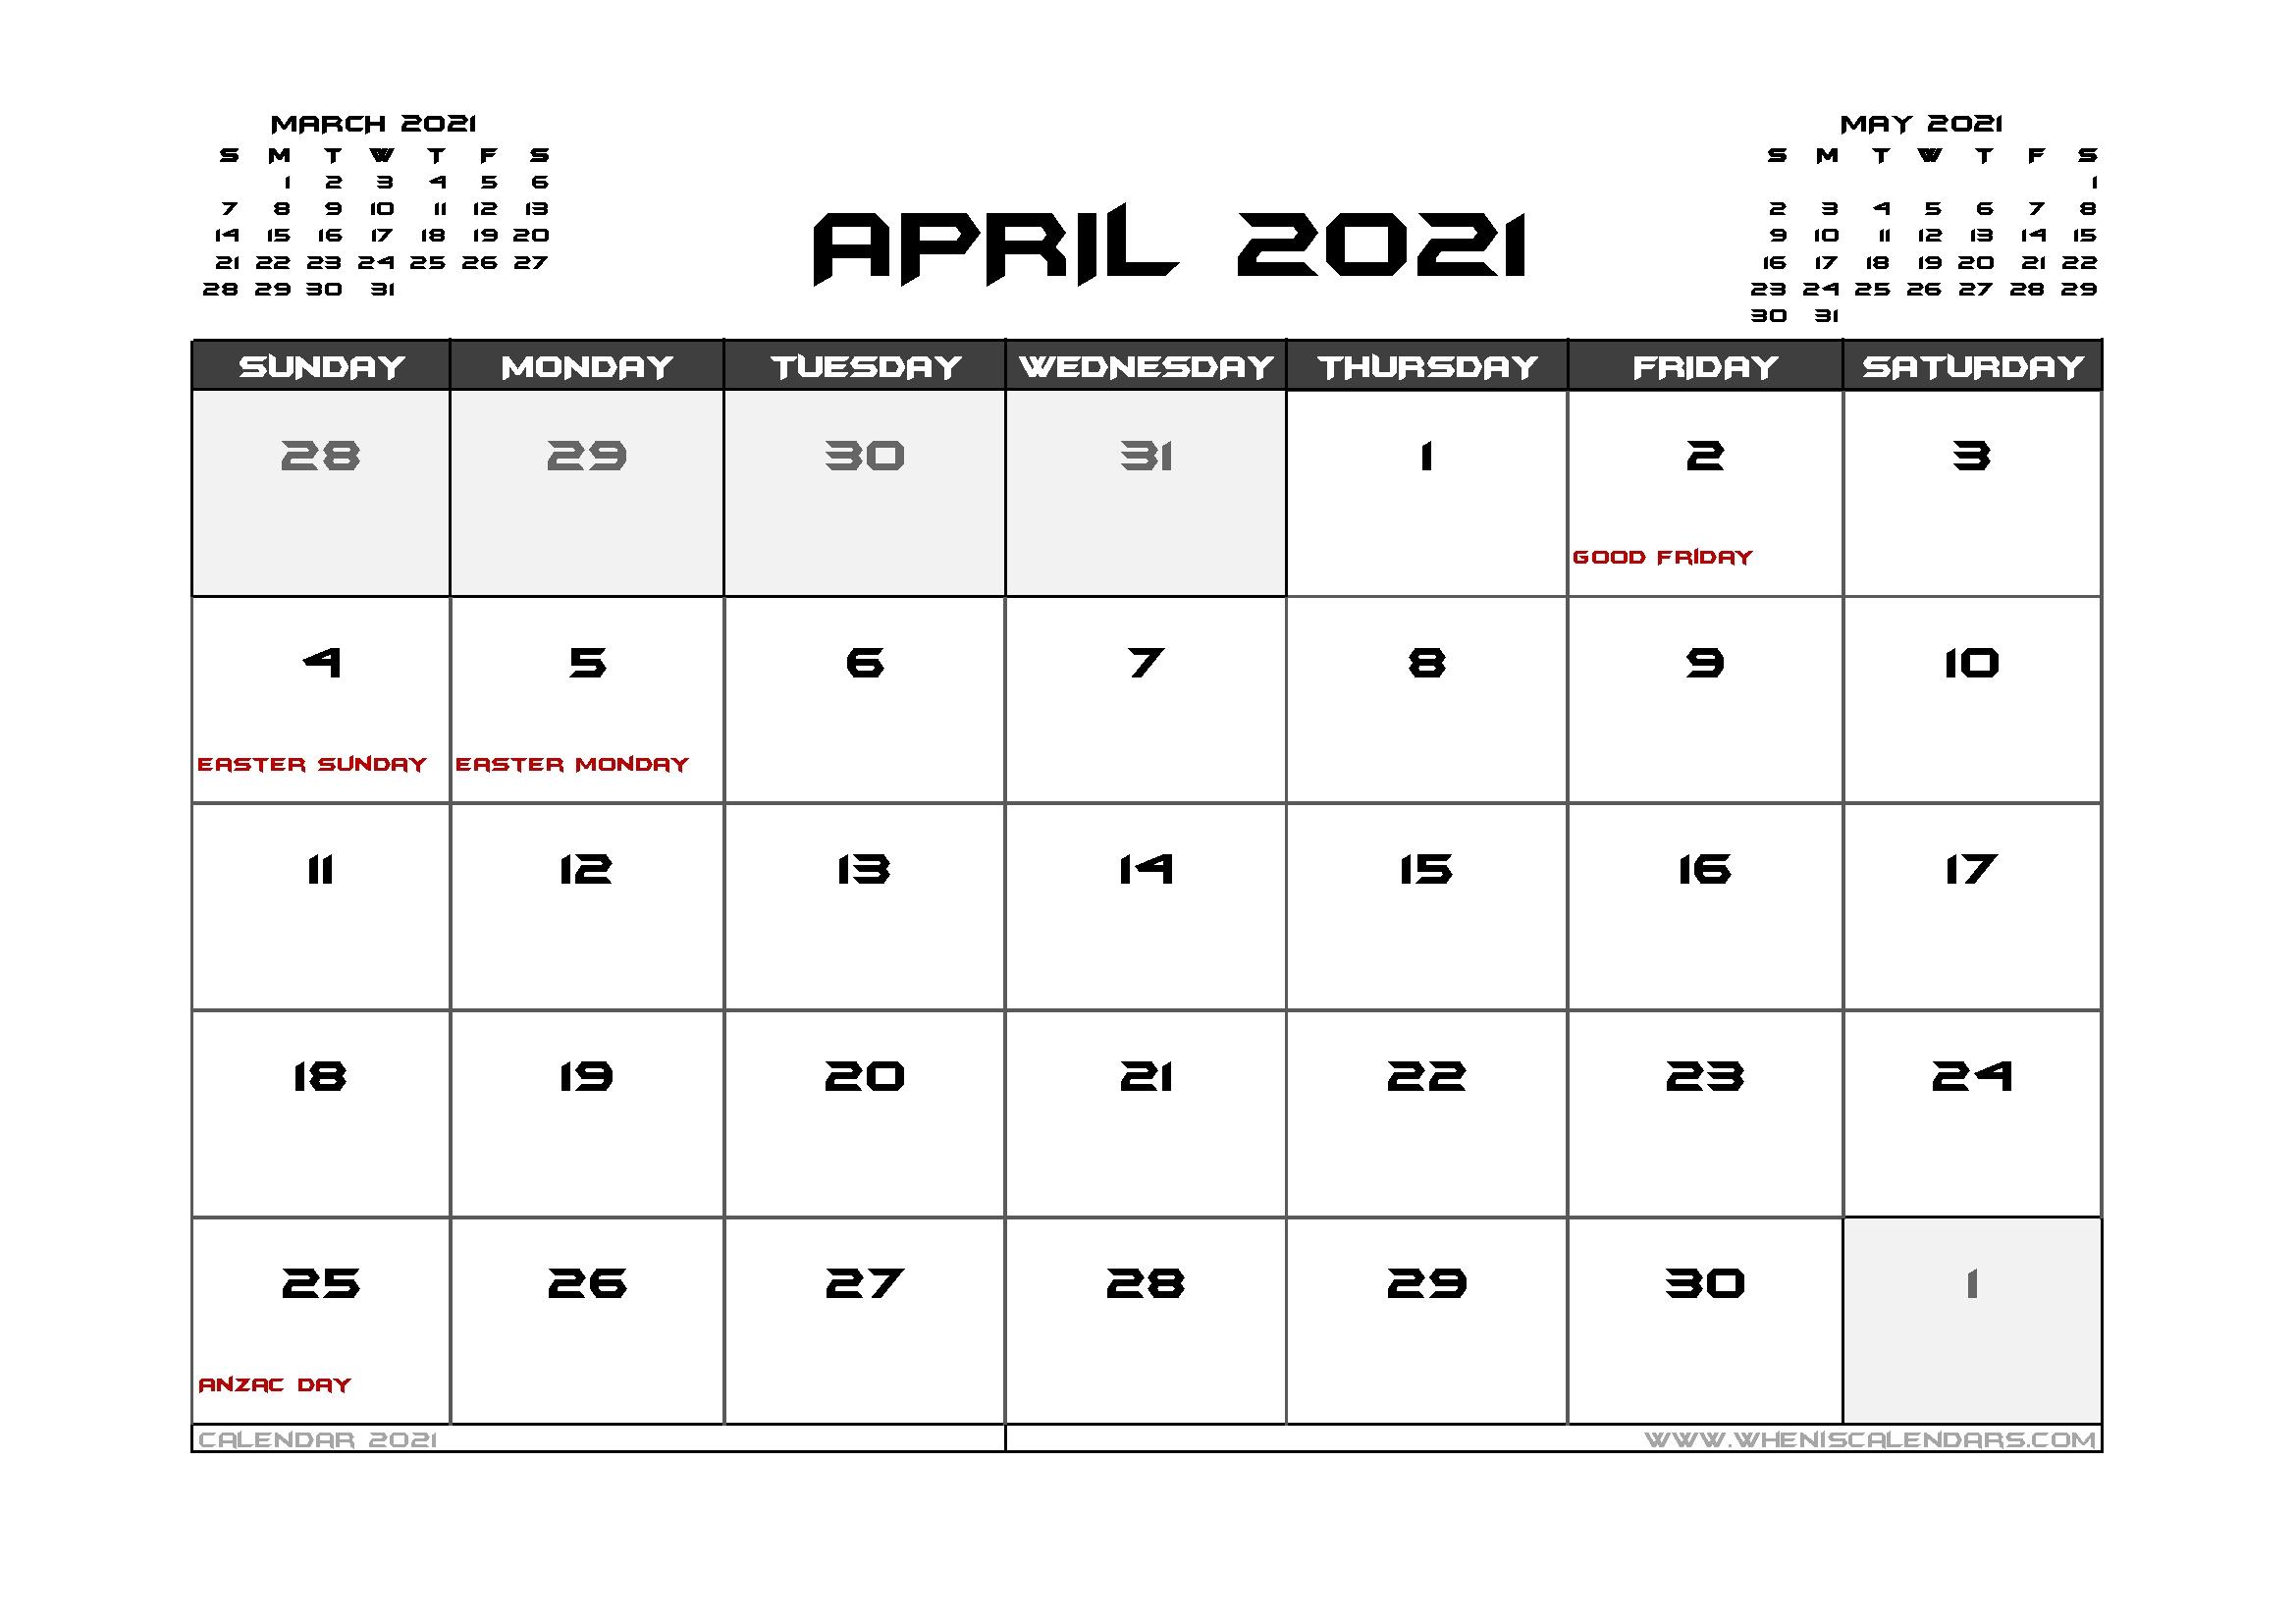 20+ Calendar 2021 Australia Public Holidays - Free Download Printable Calendar Templates ️